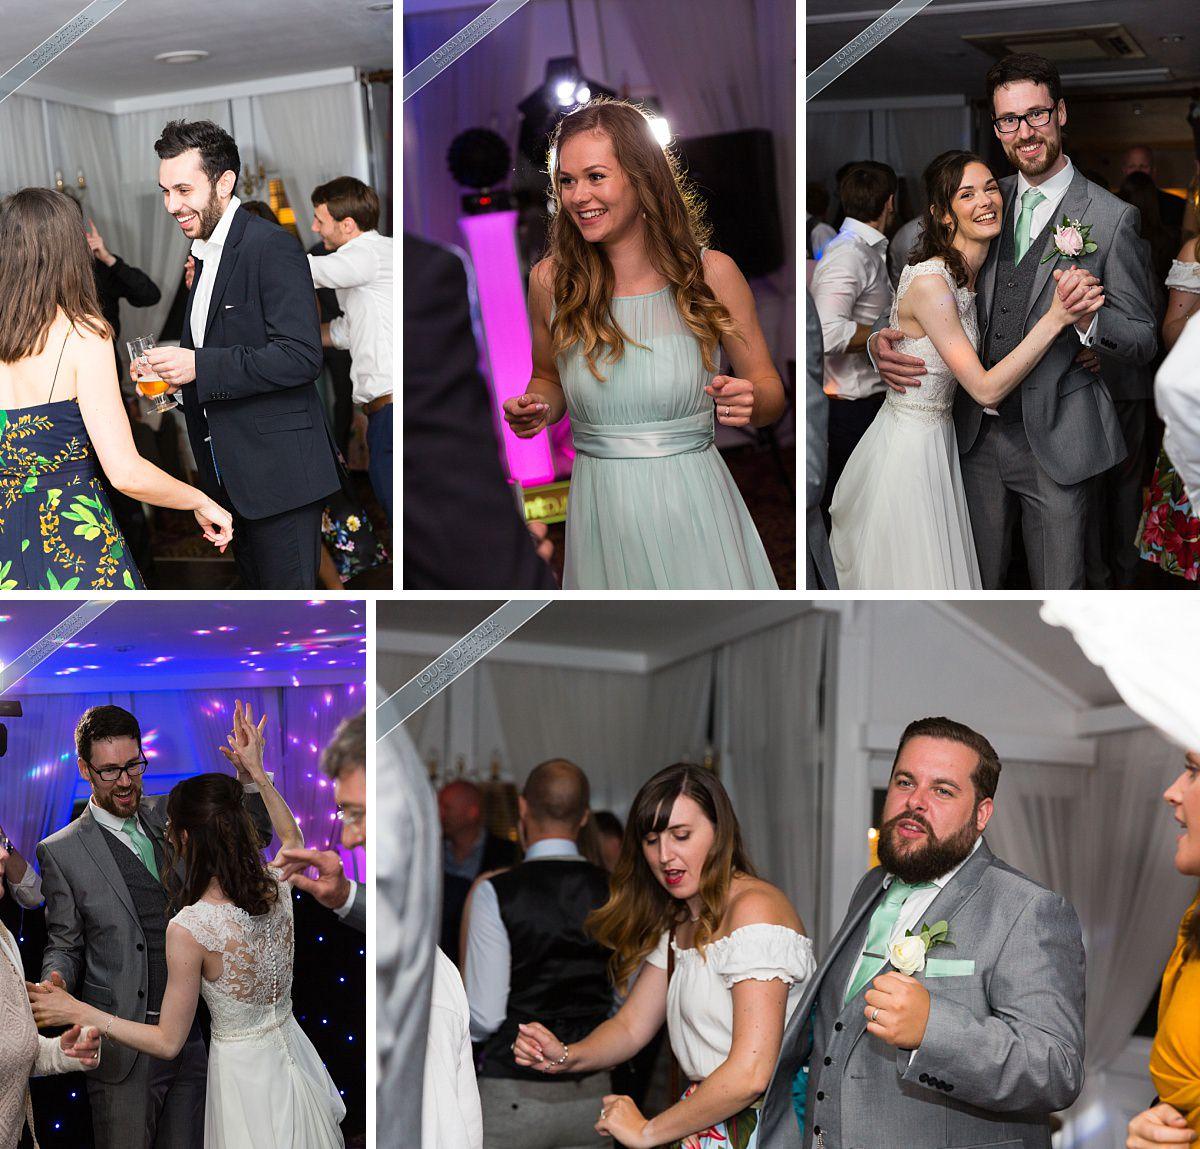 Chilston Park Hotel, Louisa Dettmer Wedding Photography